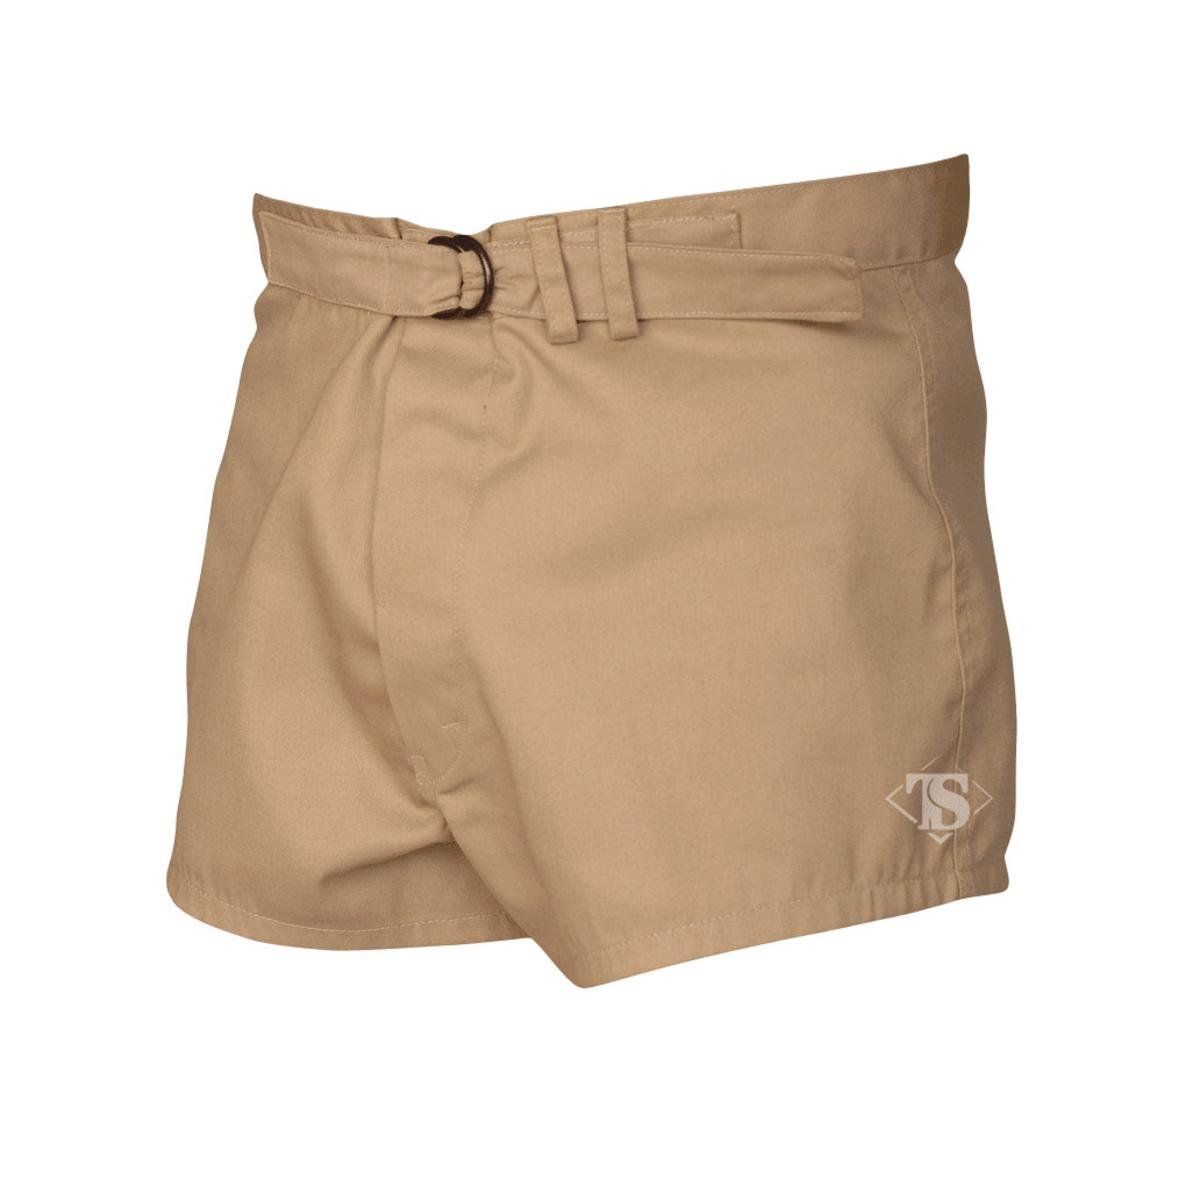 Tru-Spec Udt Shorts TS4224